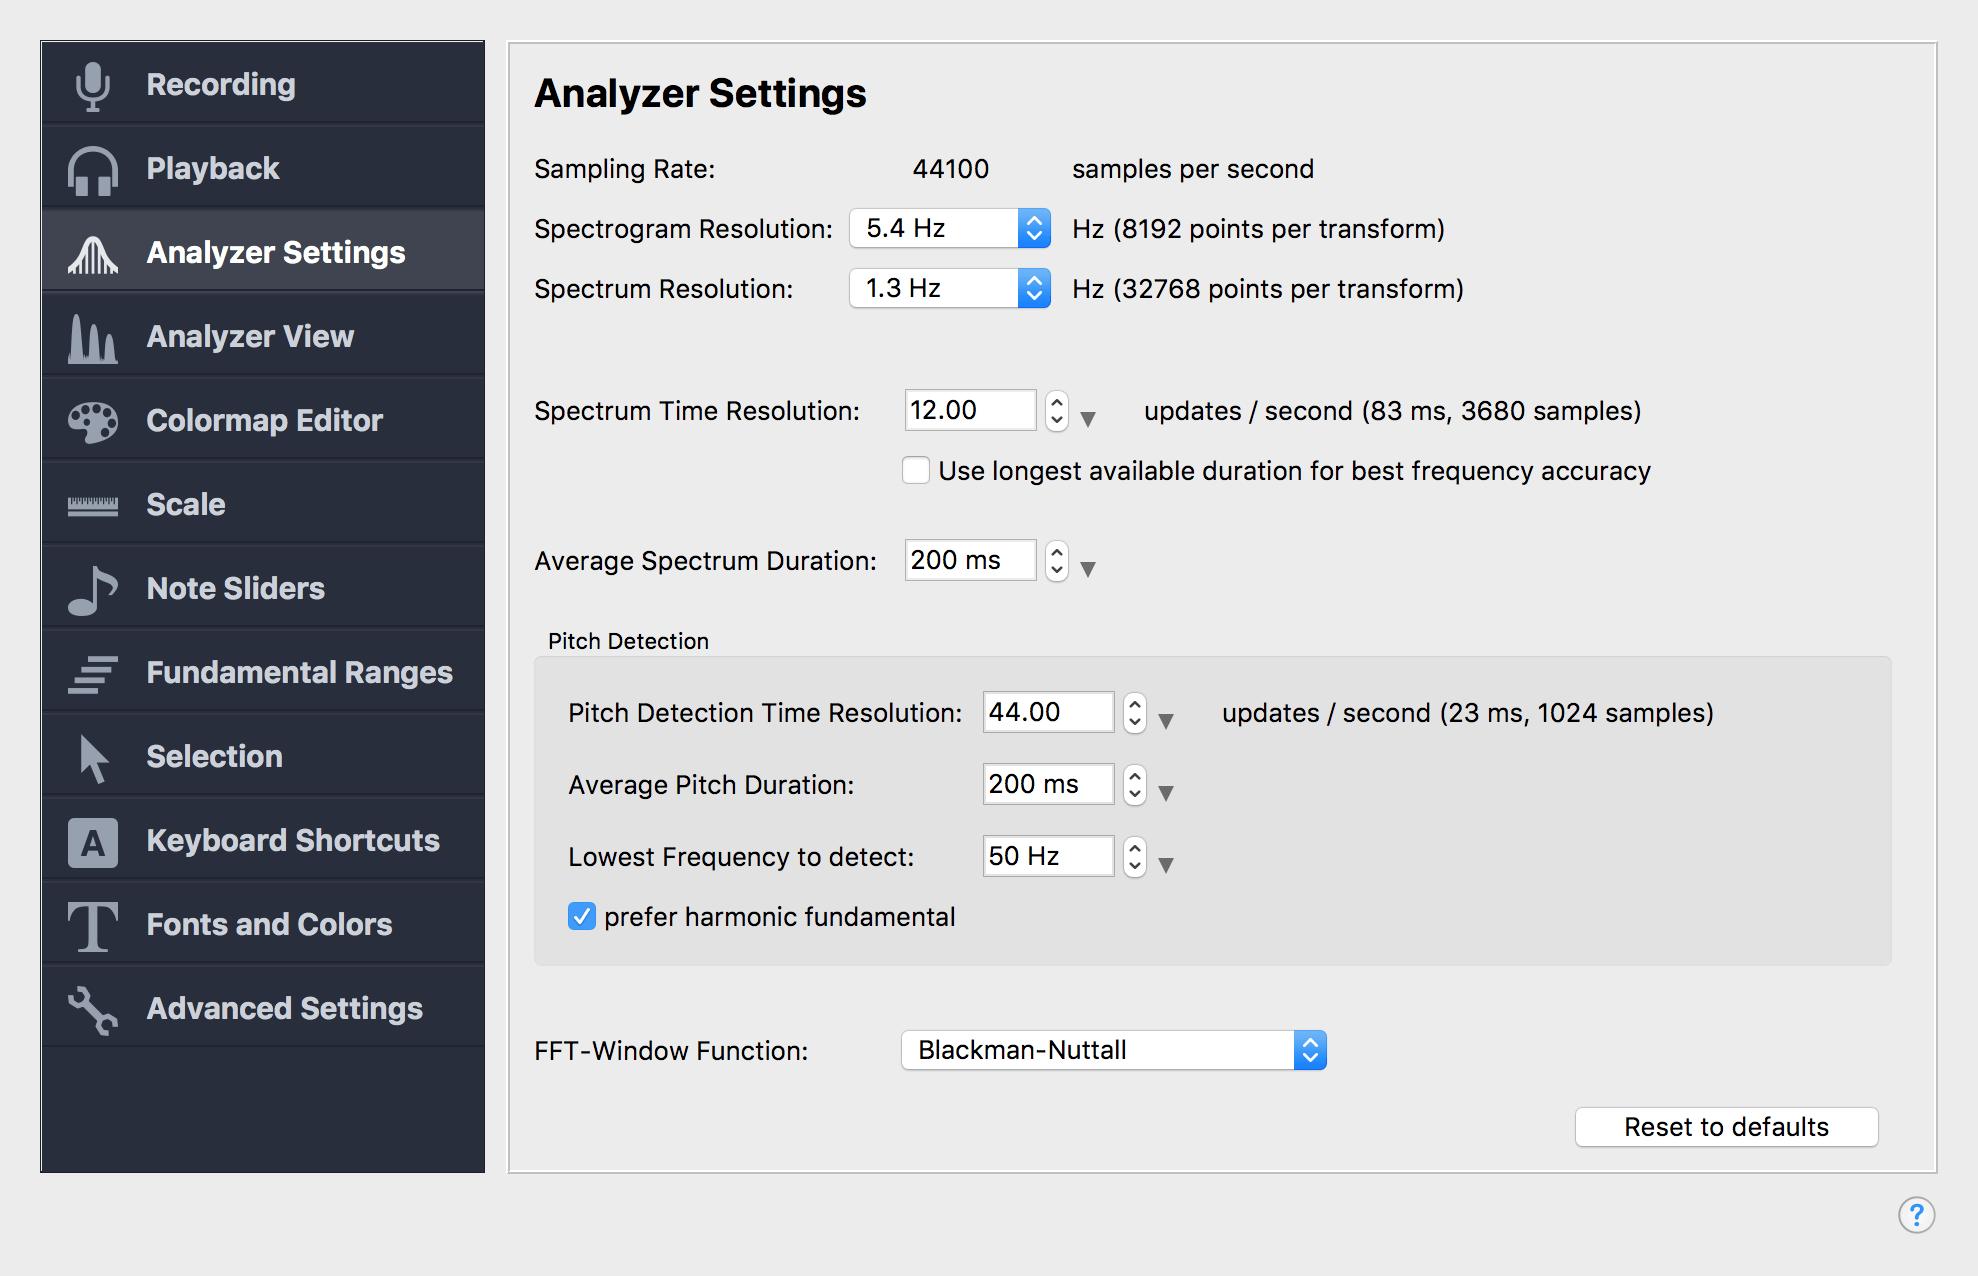 Analyzer Settings